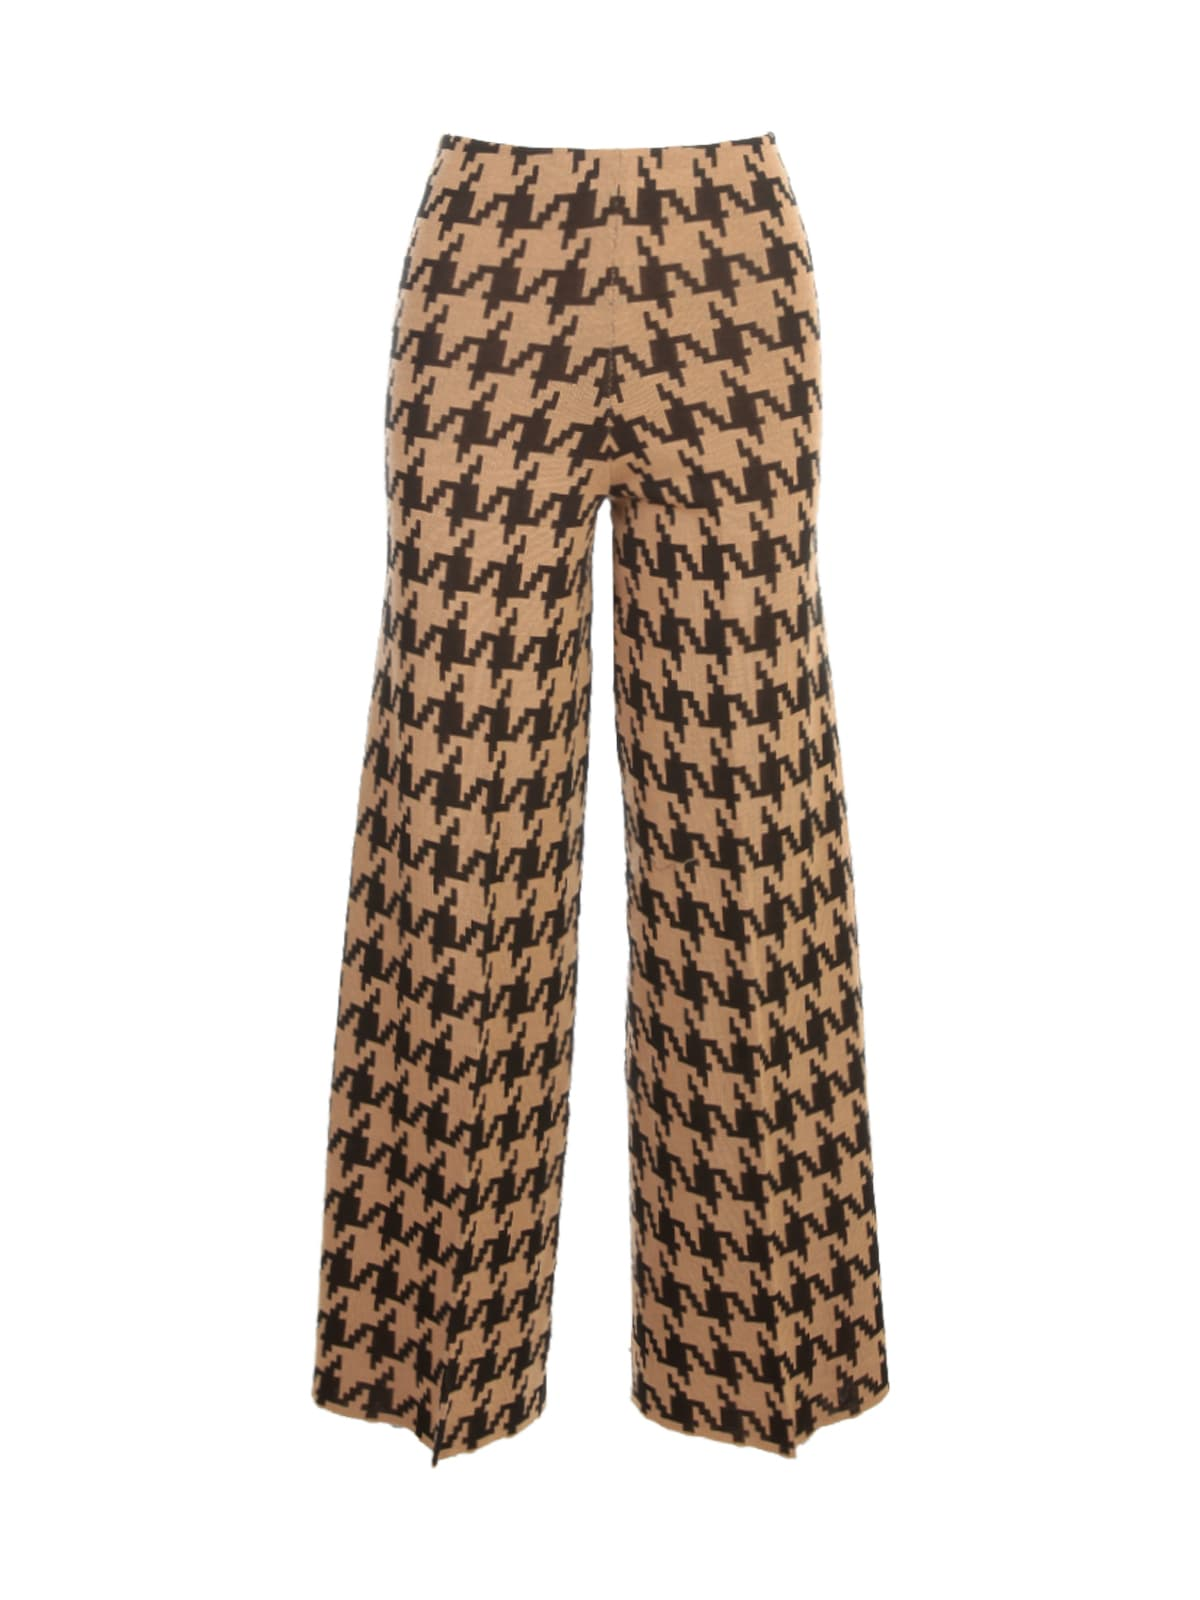 Pied De Poule High Waisted Trousers